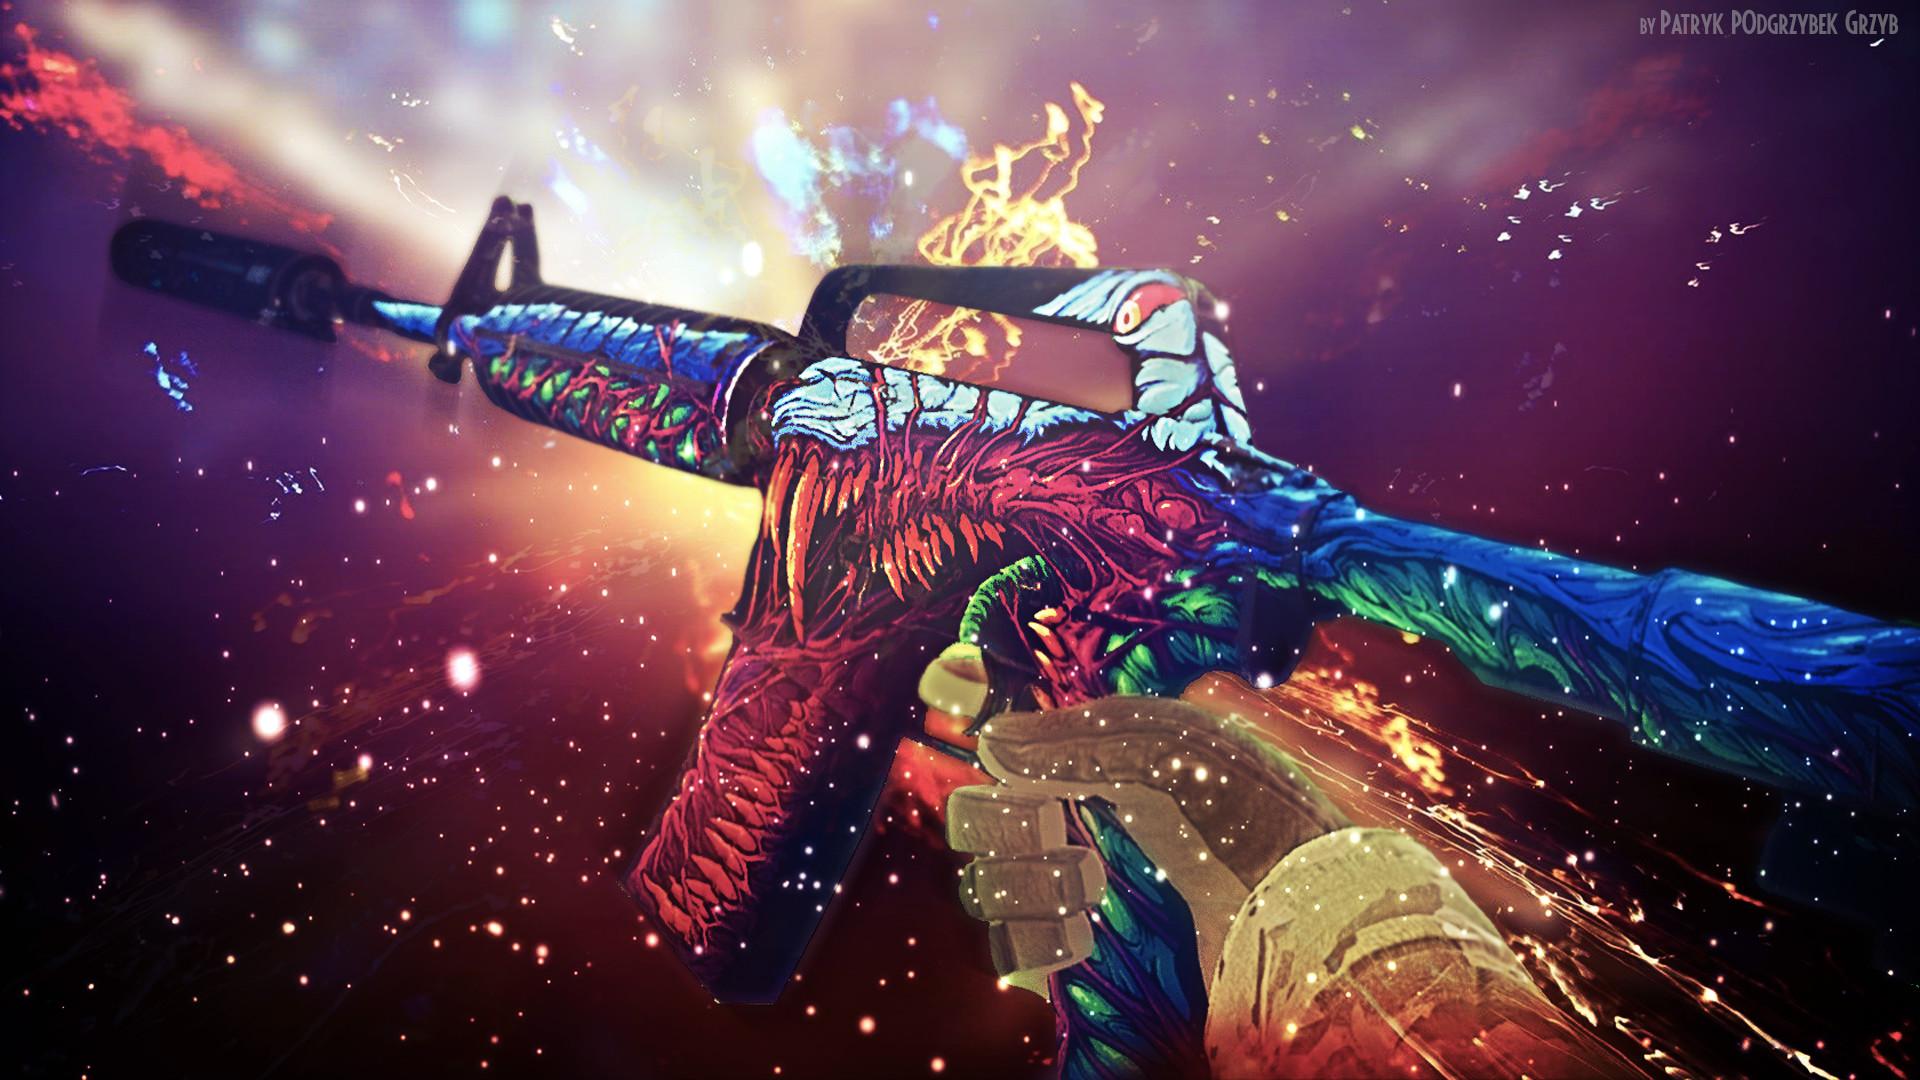 Steam Community :: :: m4a1-s | Hyper Beast – Wallpaper by Patryk